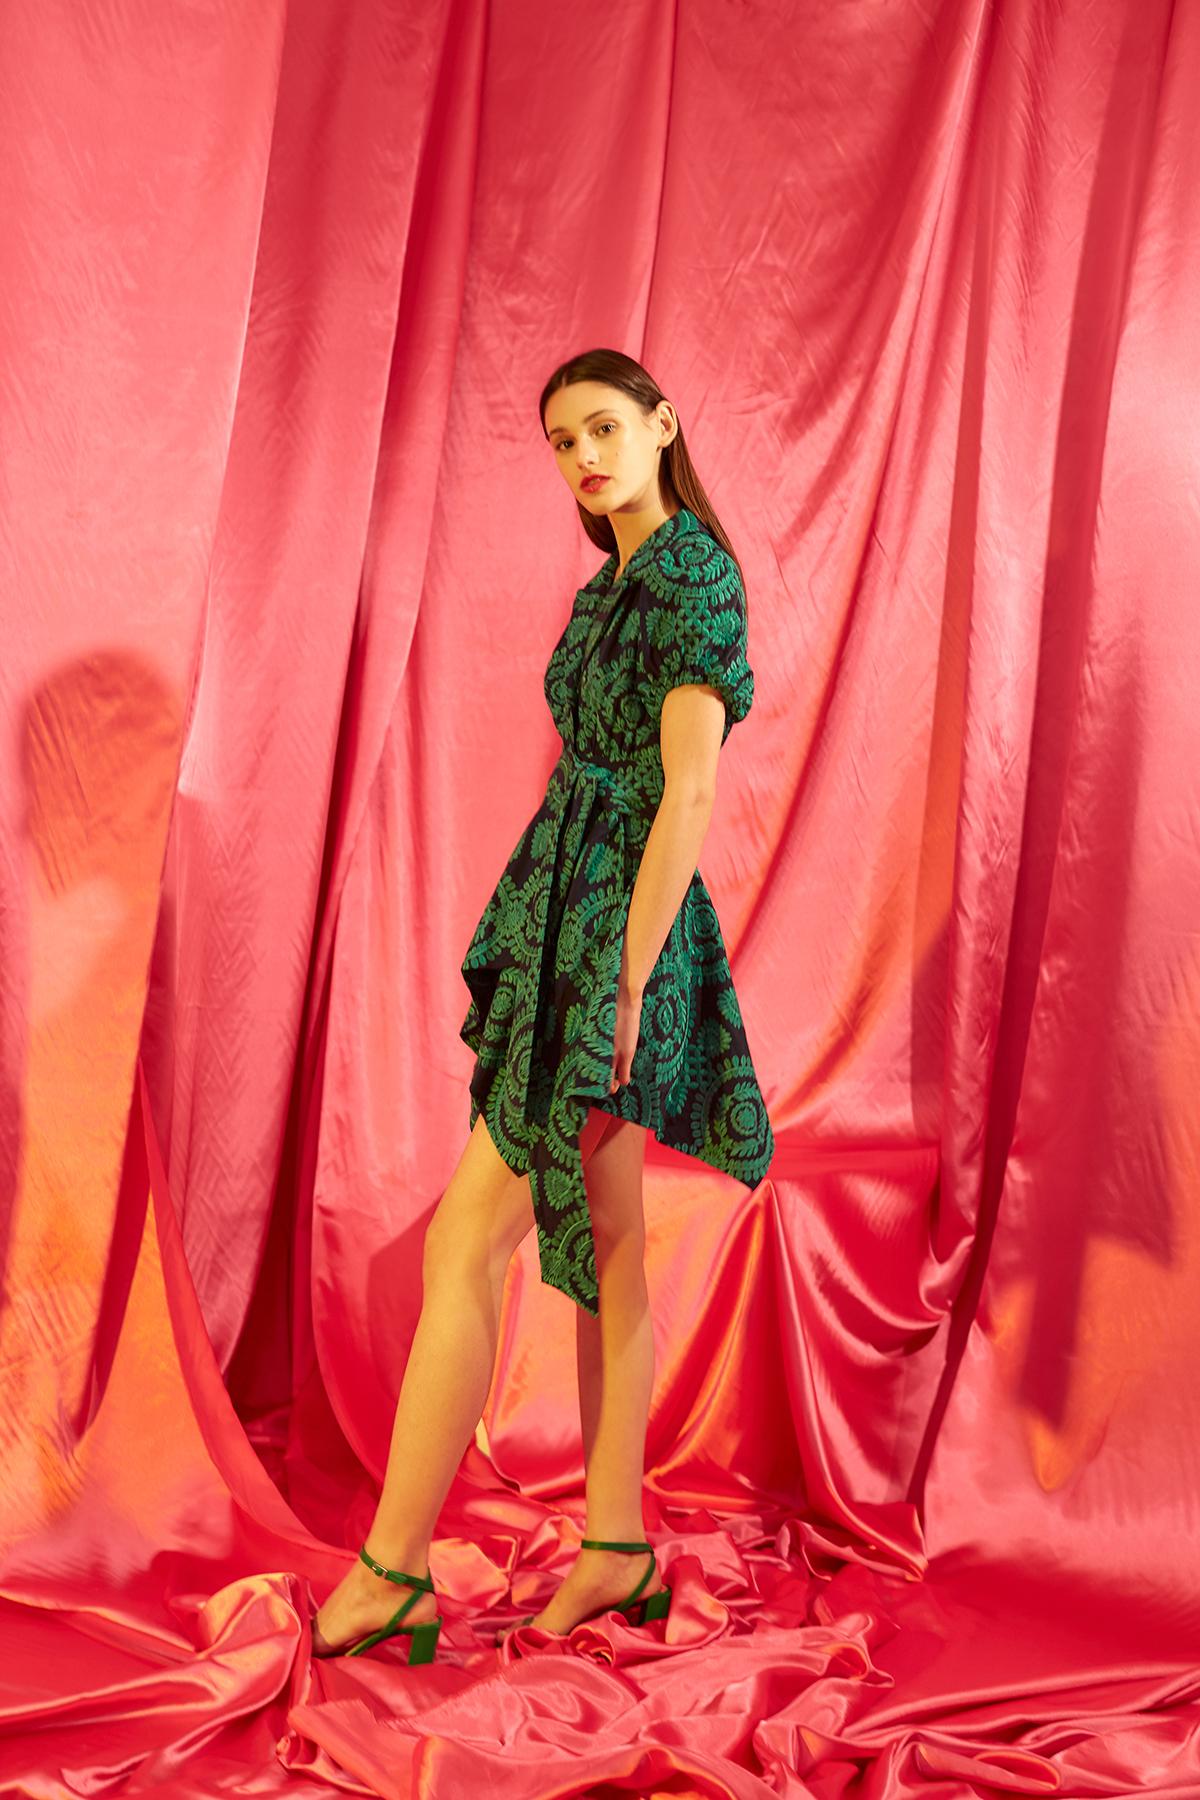 Shop C/MEO Impressed Mini Dress.